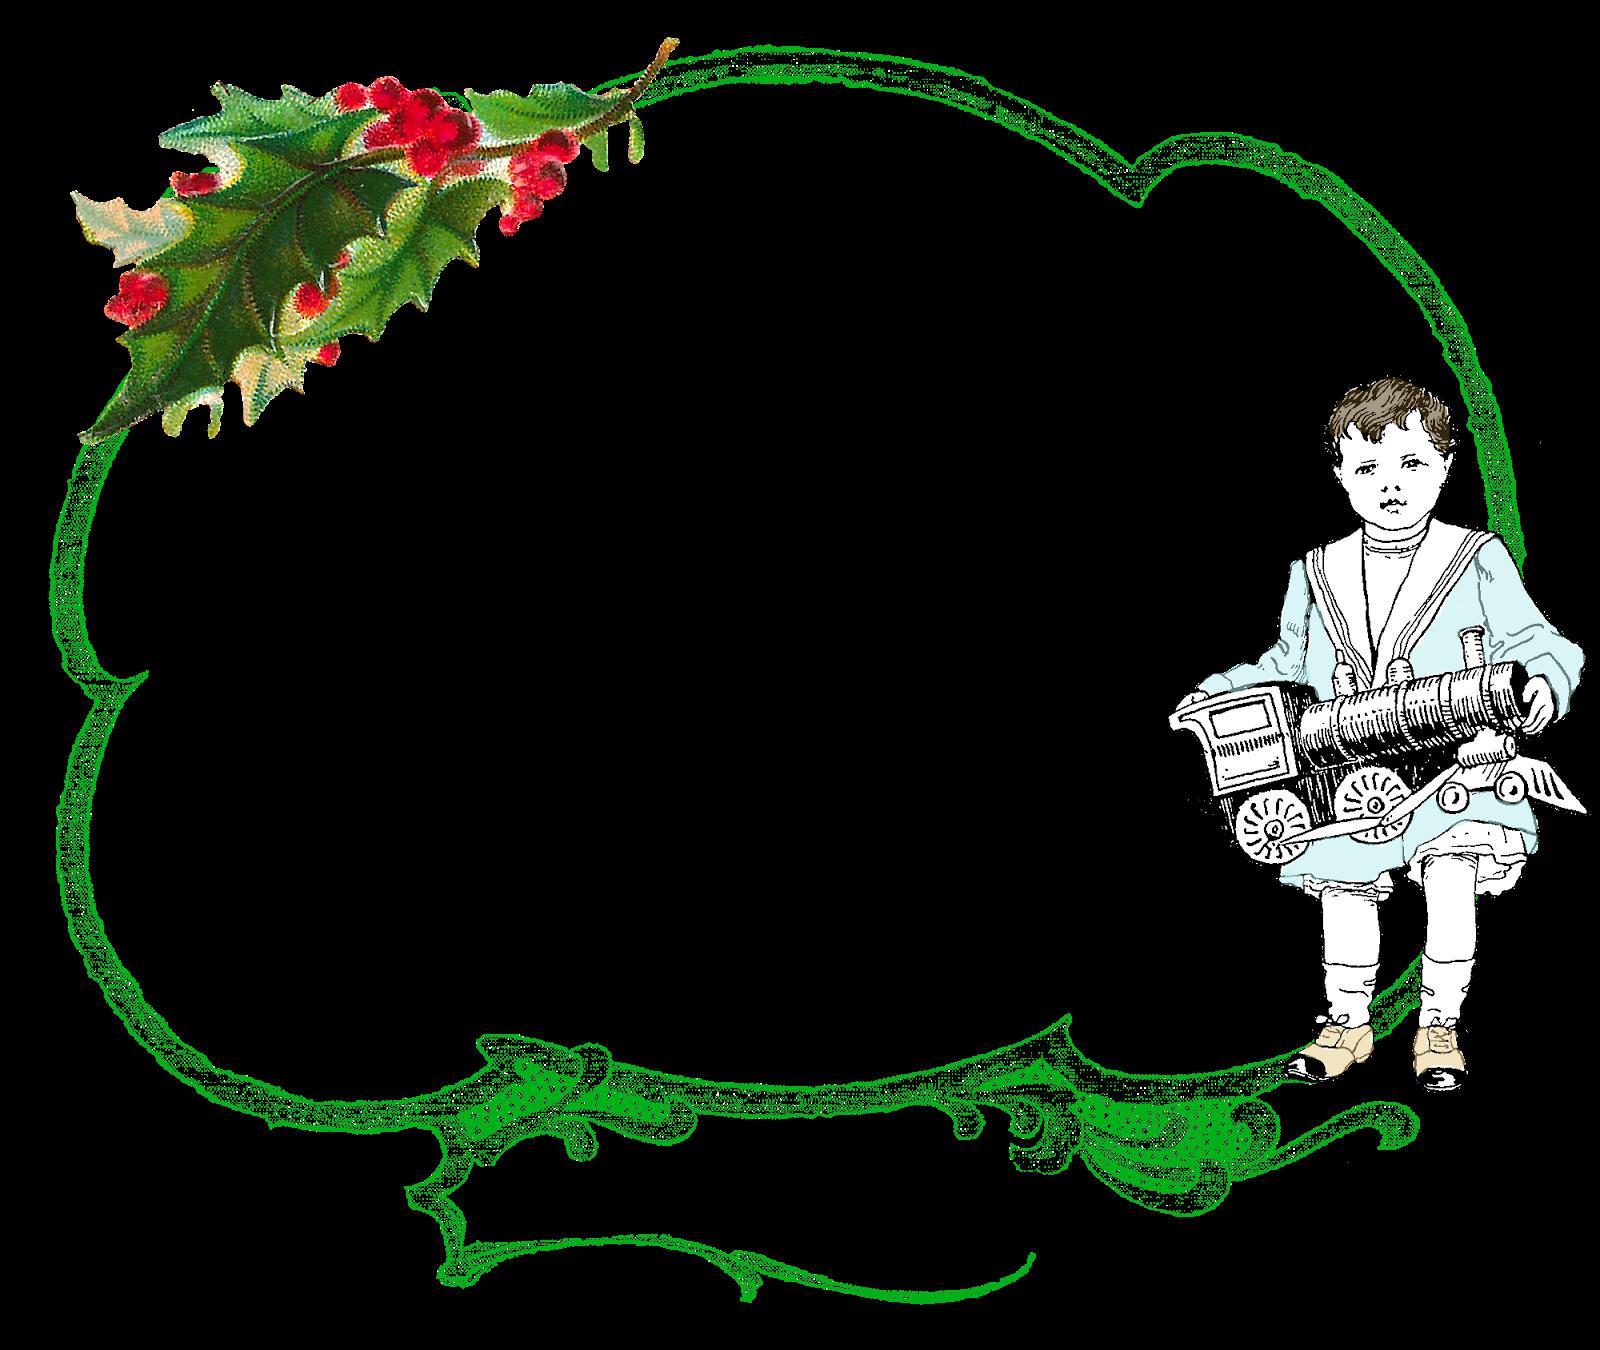 The Graphics Monarch Printable Christmas Border Crafting Design